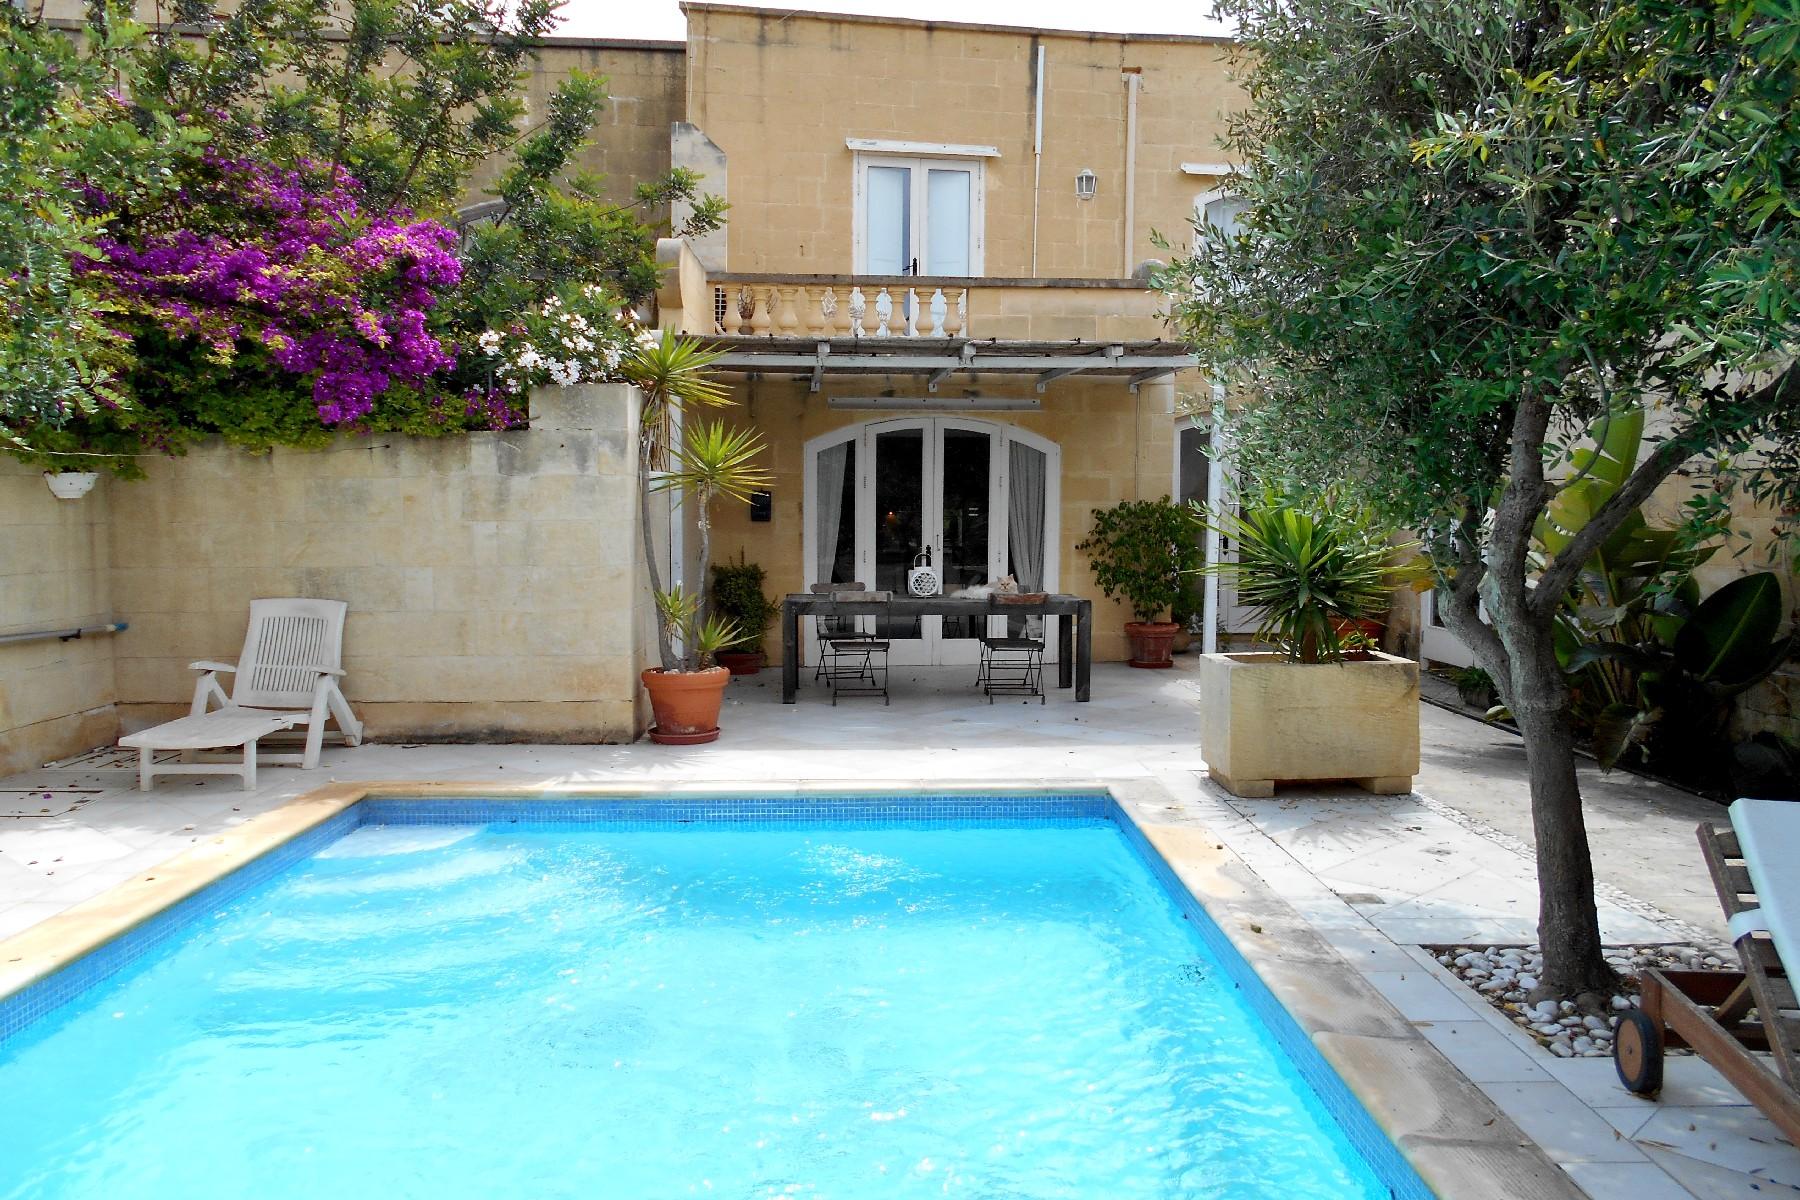 Malta Property for sale in Gozo-Island, Munxar